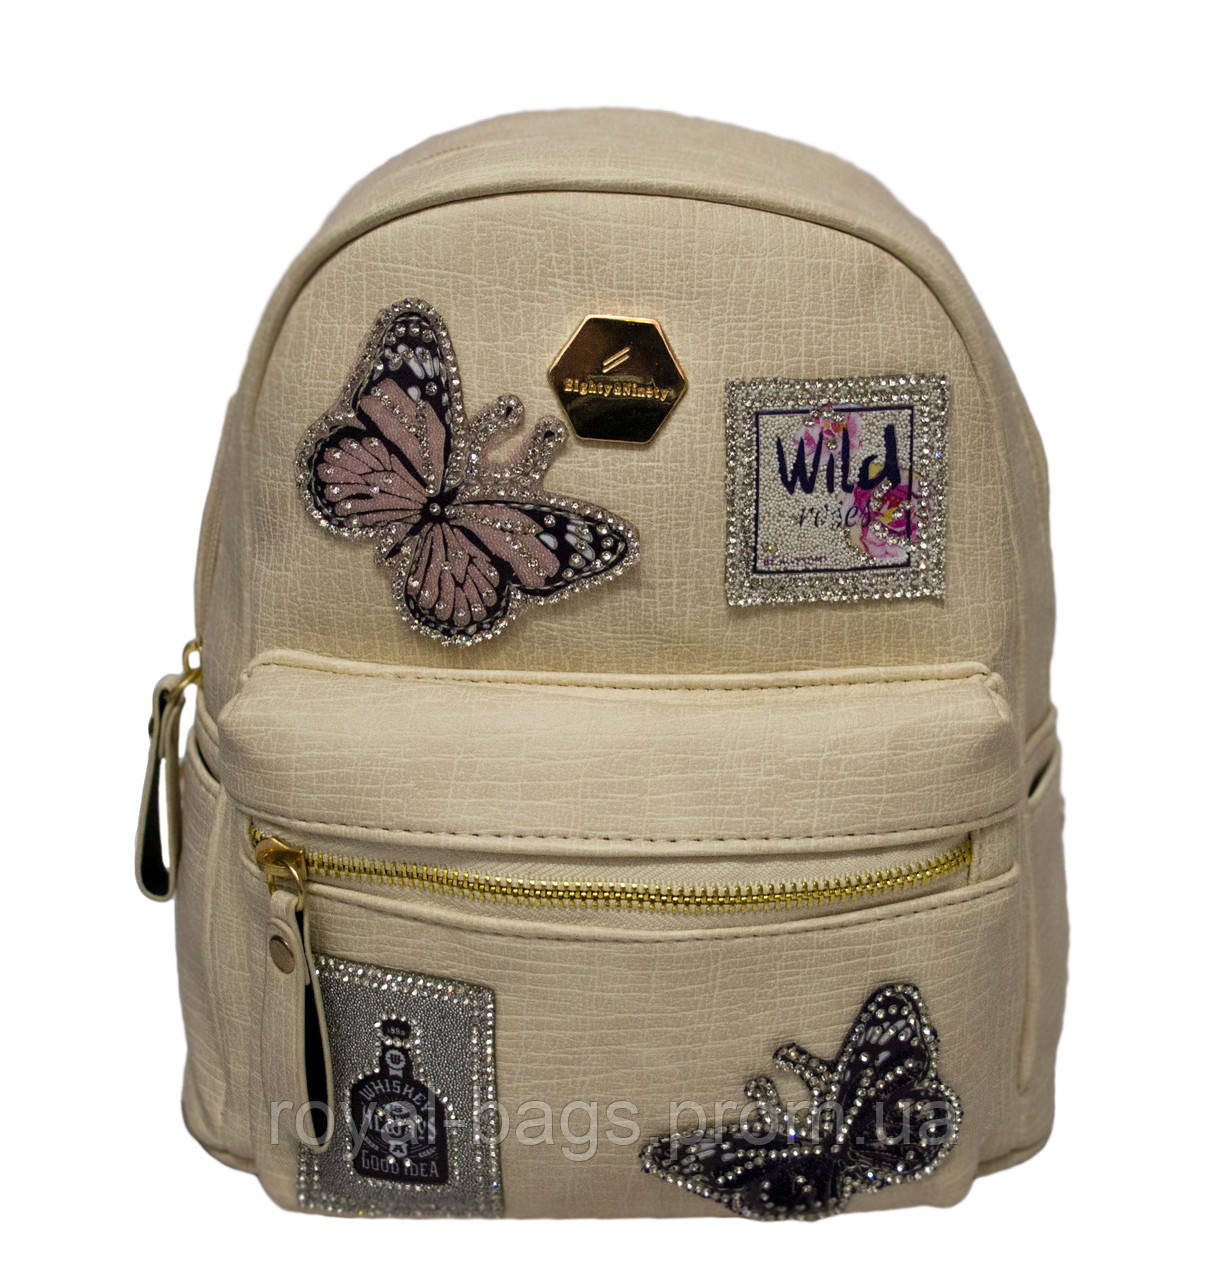 Рюкзак Wild butterfly 4 Цвета Бежевый